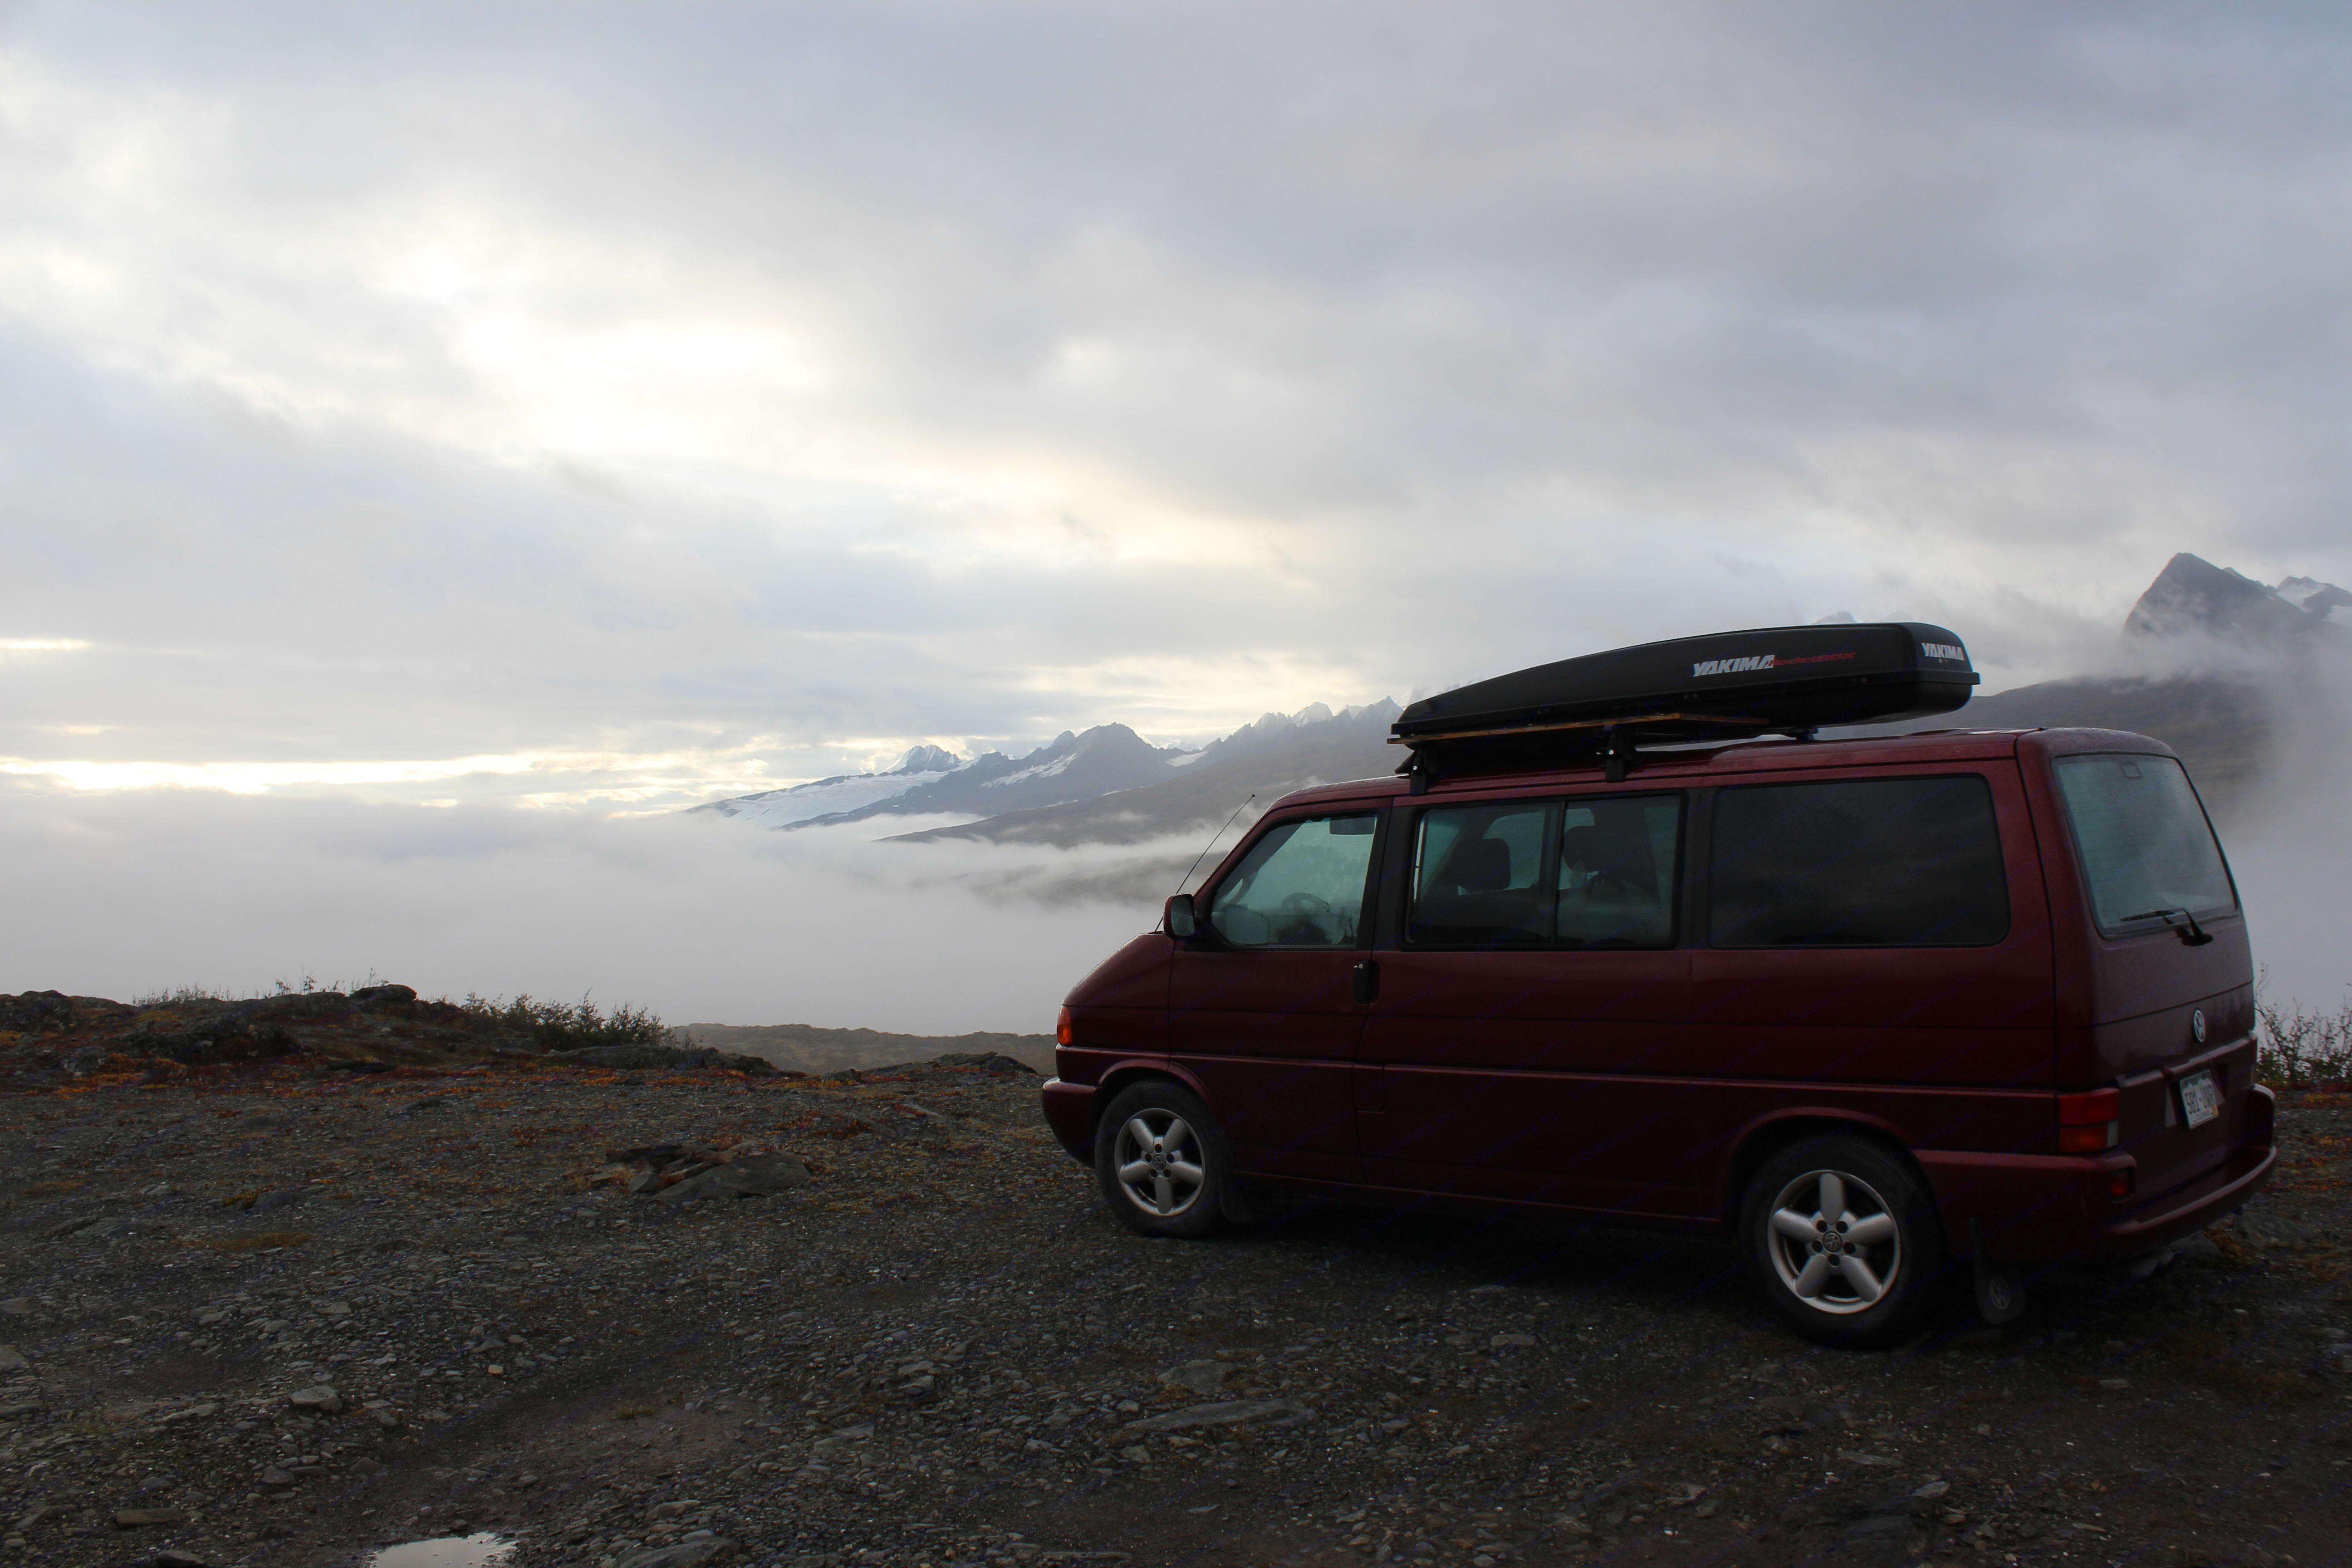 Legendary Thompson Pass. Volkswagen Eurovan 2001